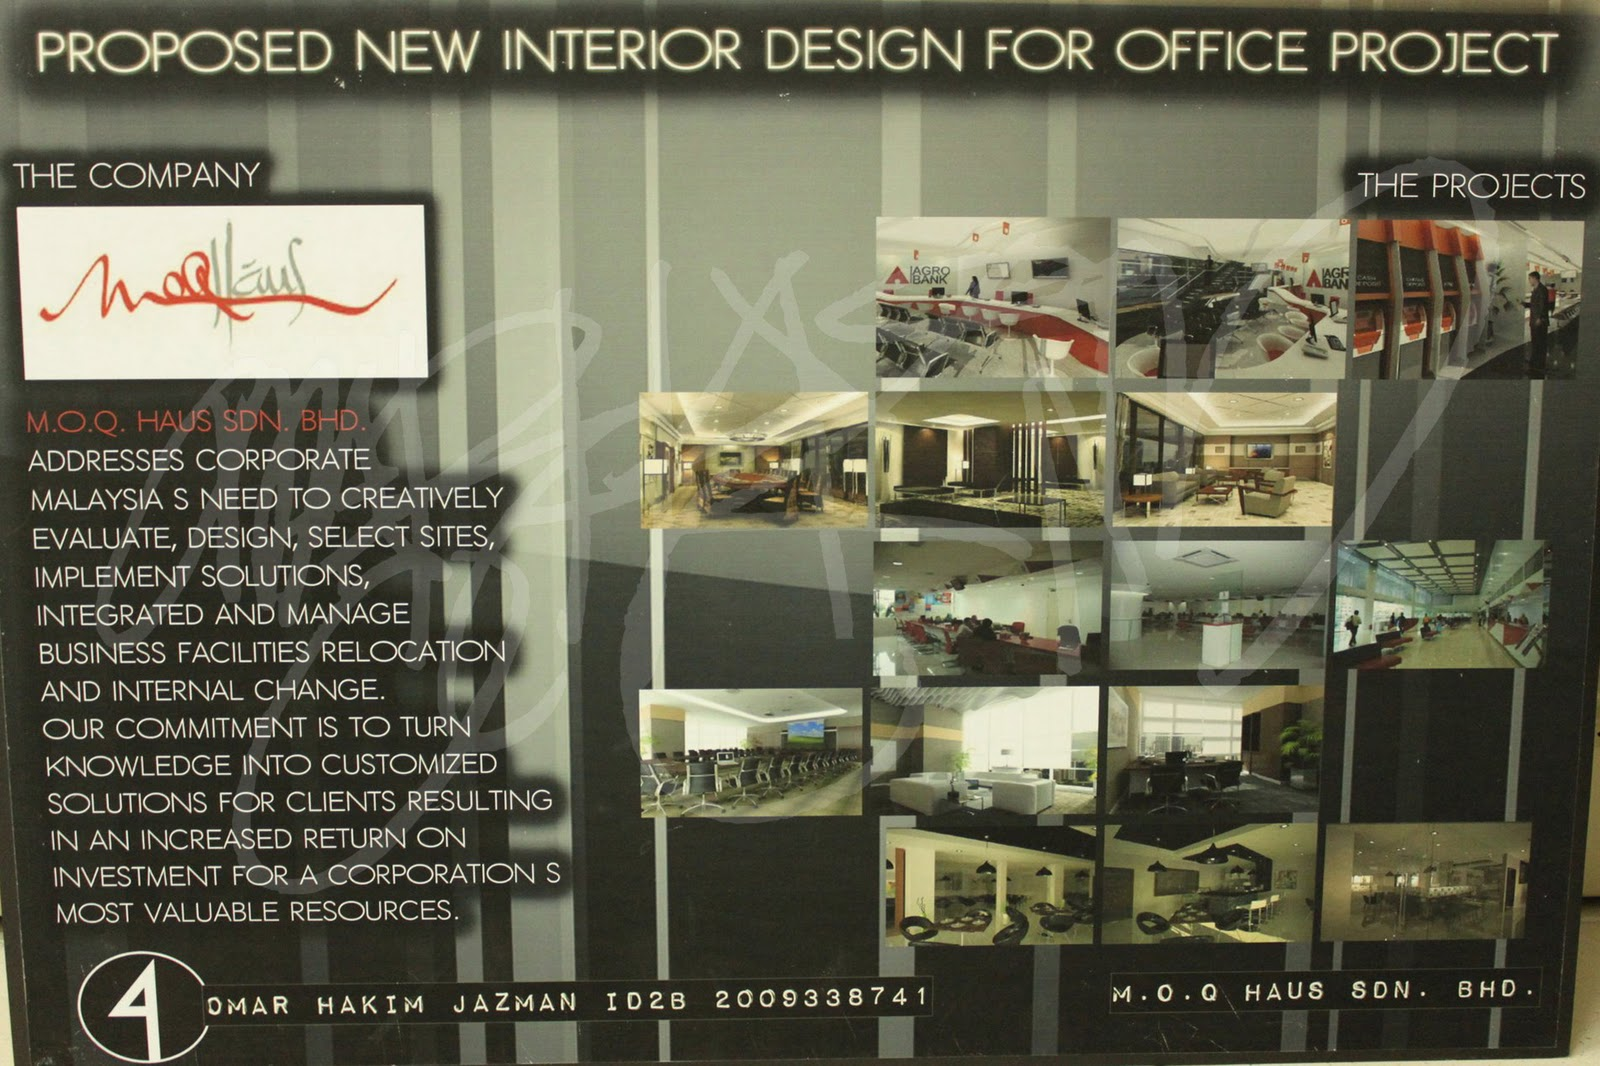 Learning Future Interior Designer Office Design Moqhaus Sdn Bhd